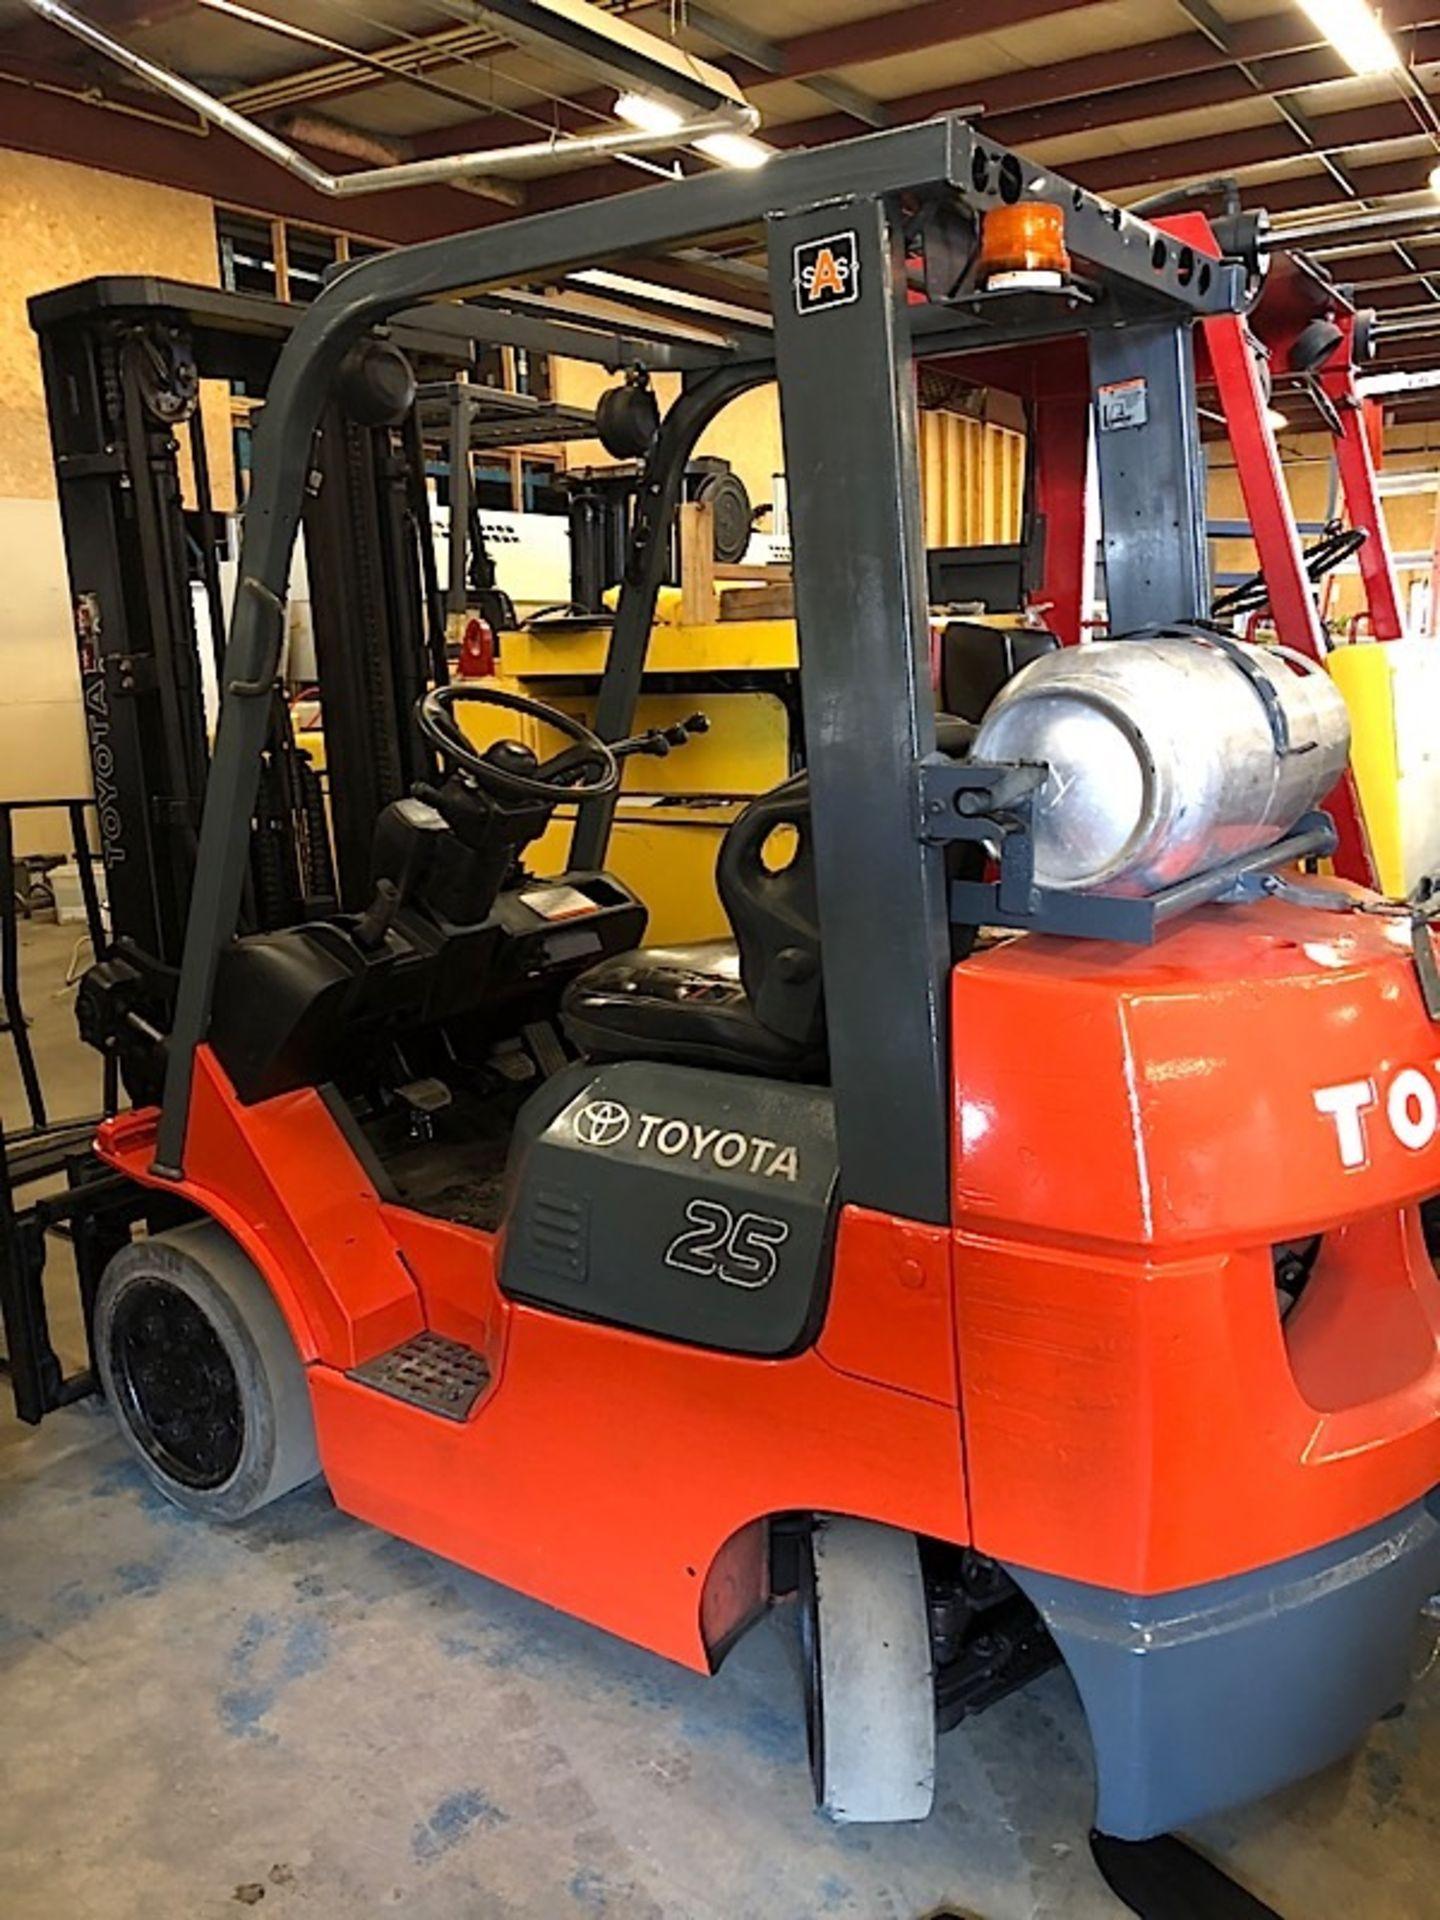 Lot 52 - Toyota (7FGCU30) 5,000 lbs. cap LPG Forklift